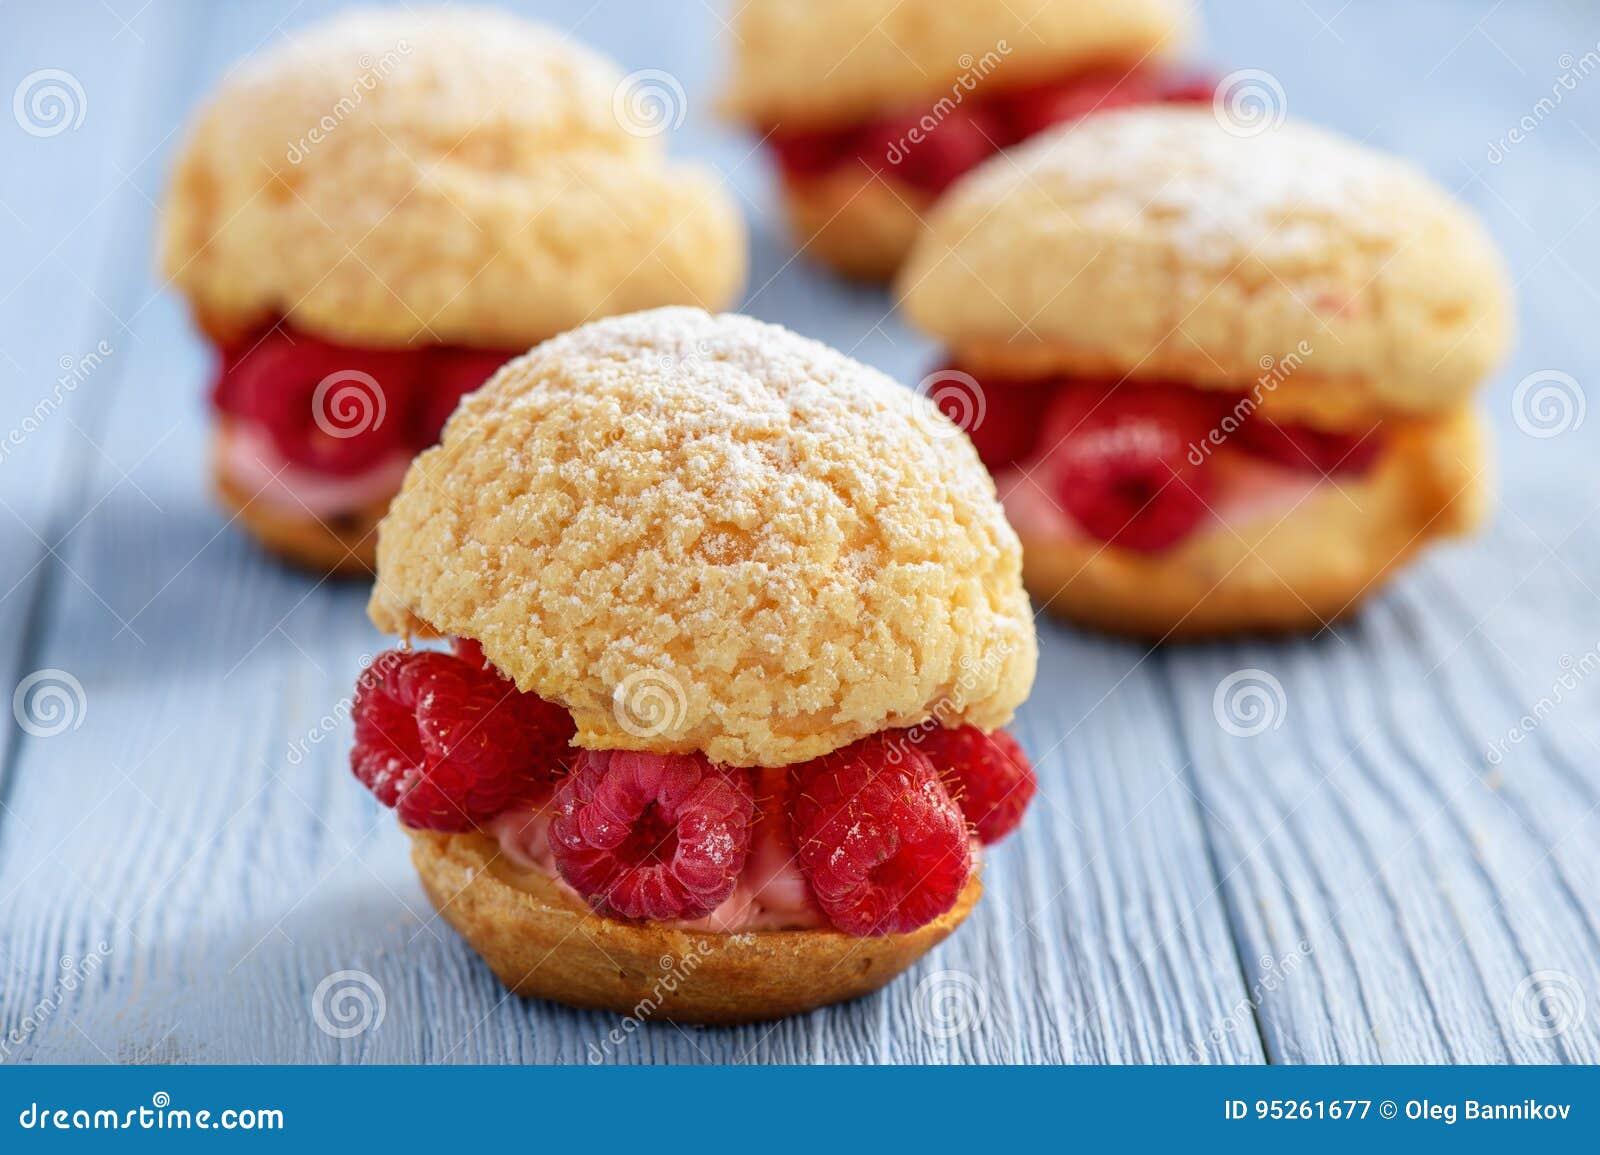 Eclairs with mascarpone cream and raspberries.